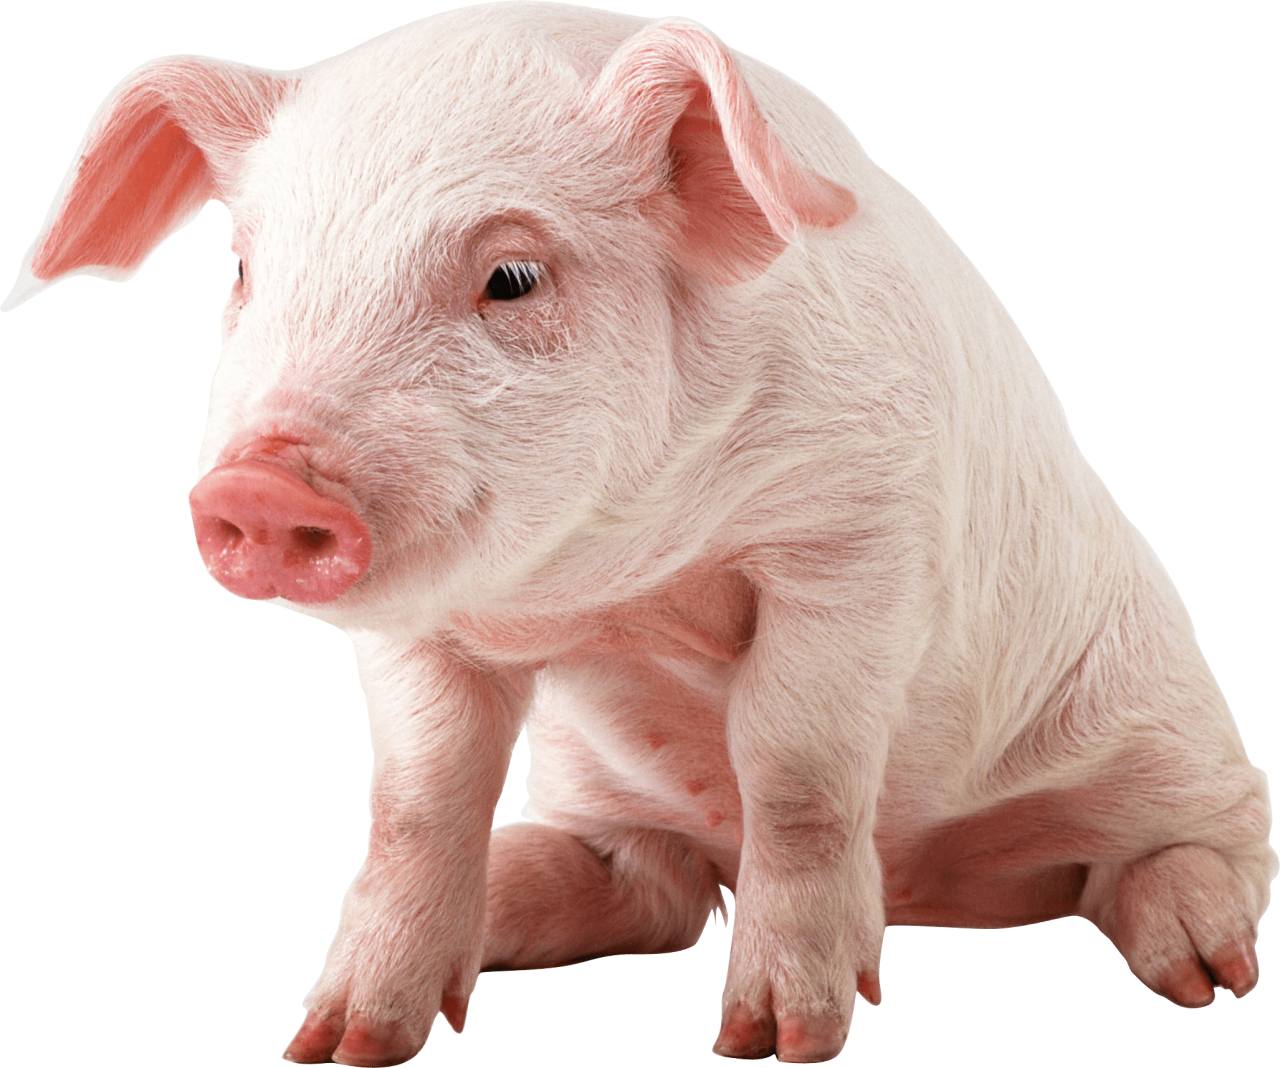 sitting baby pig PNG Image